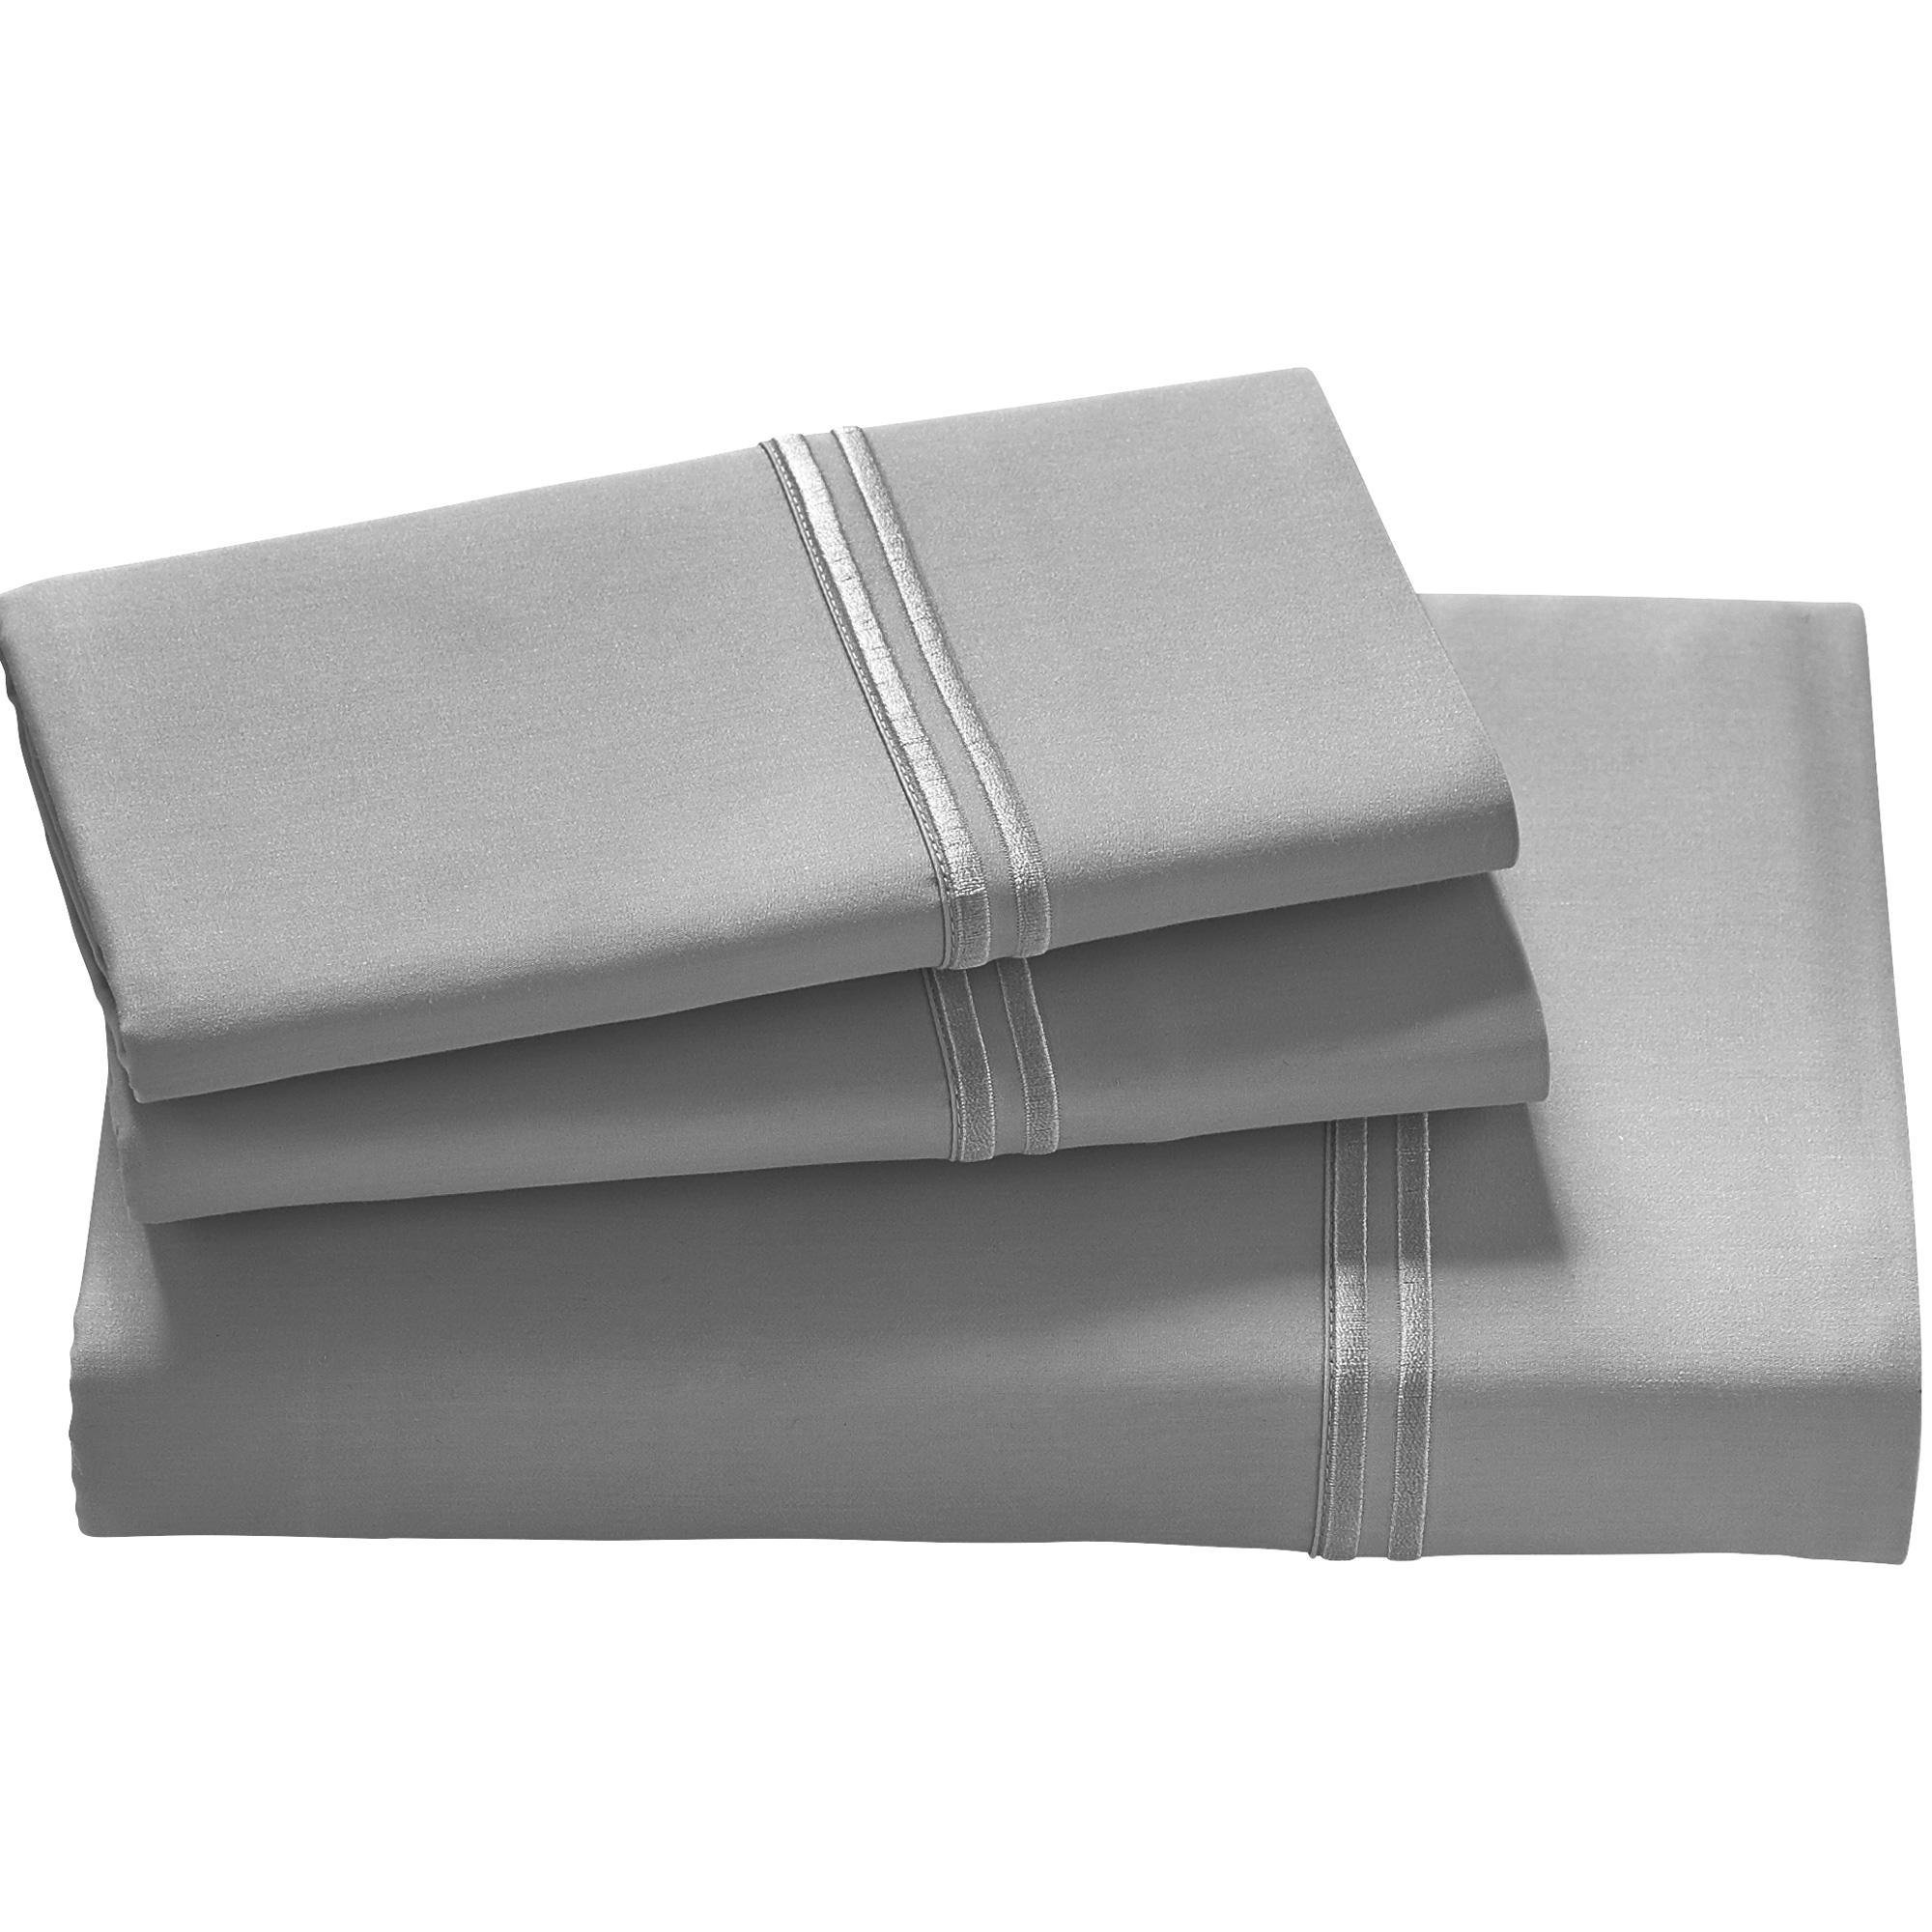 Purecare | Elements Dove Gray King Tencel Sheet Set